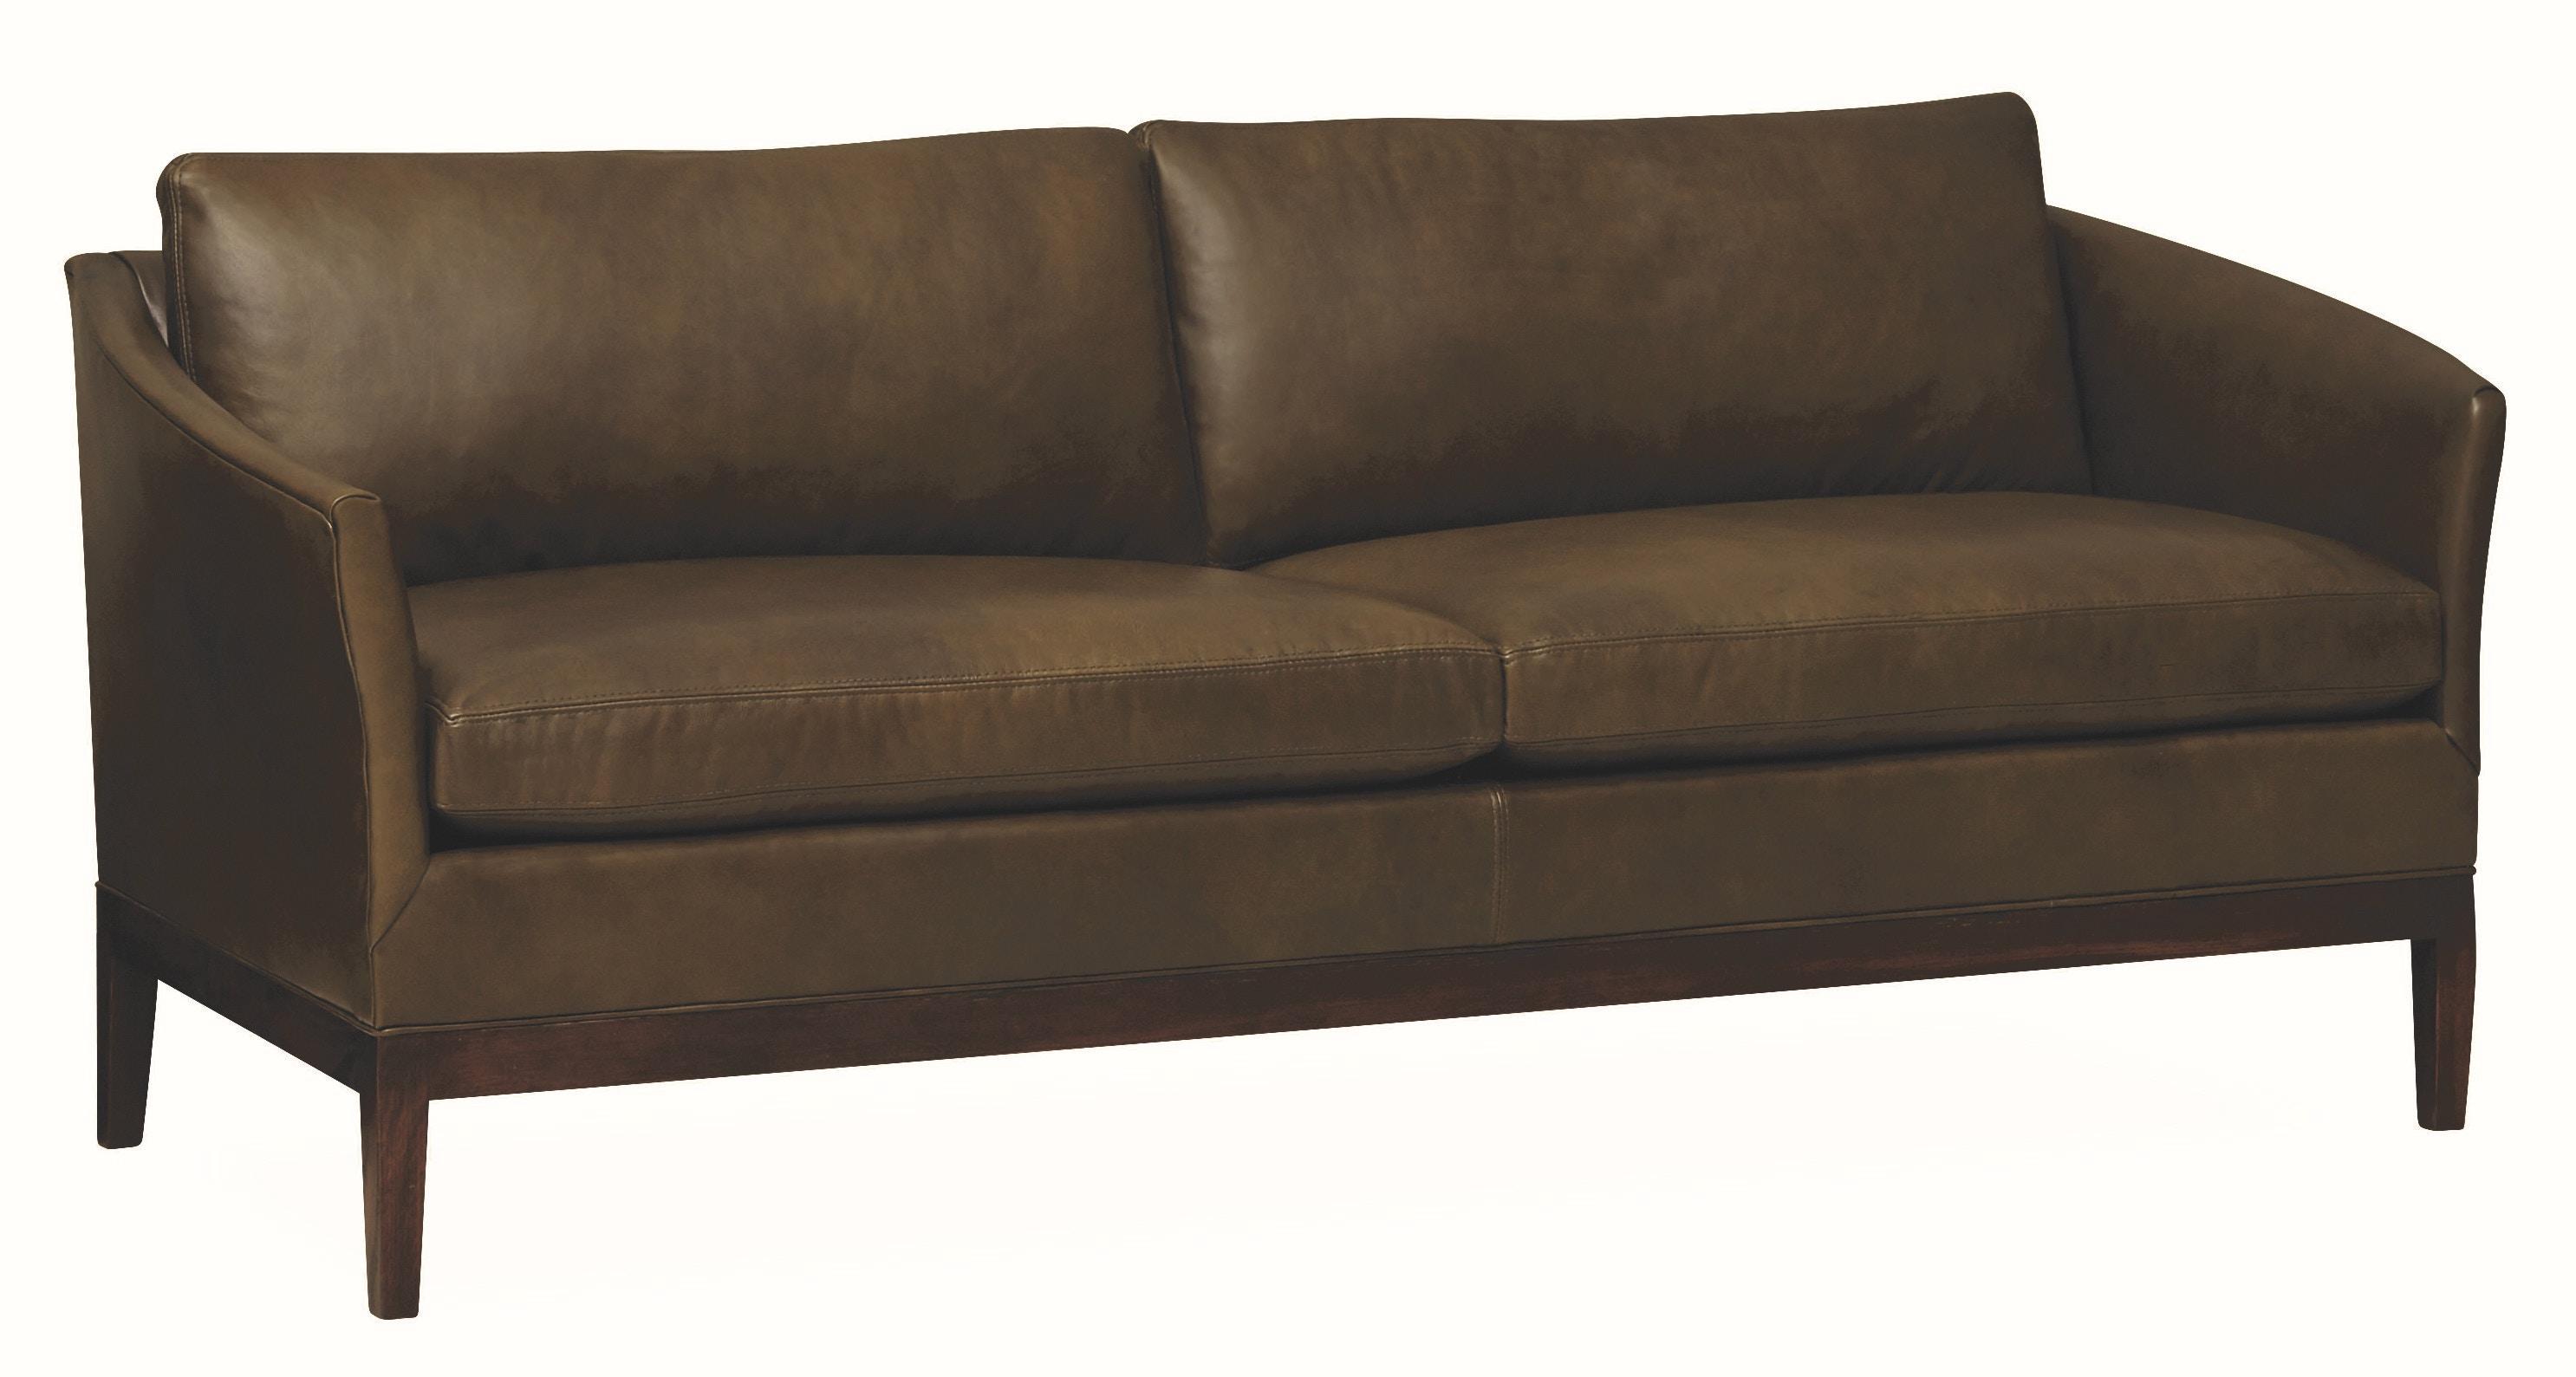 lee industries leather sofa sofascore living room apartment l1423 11